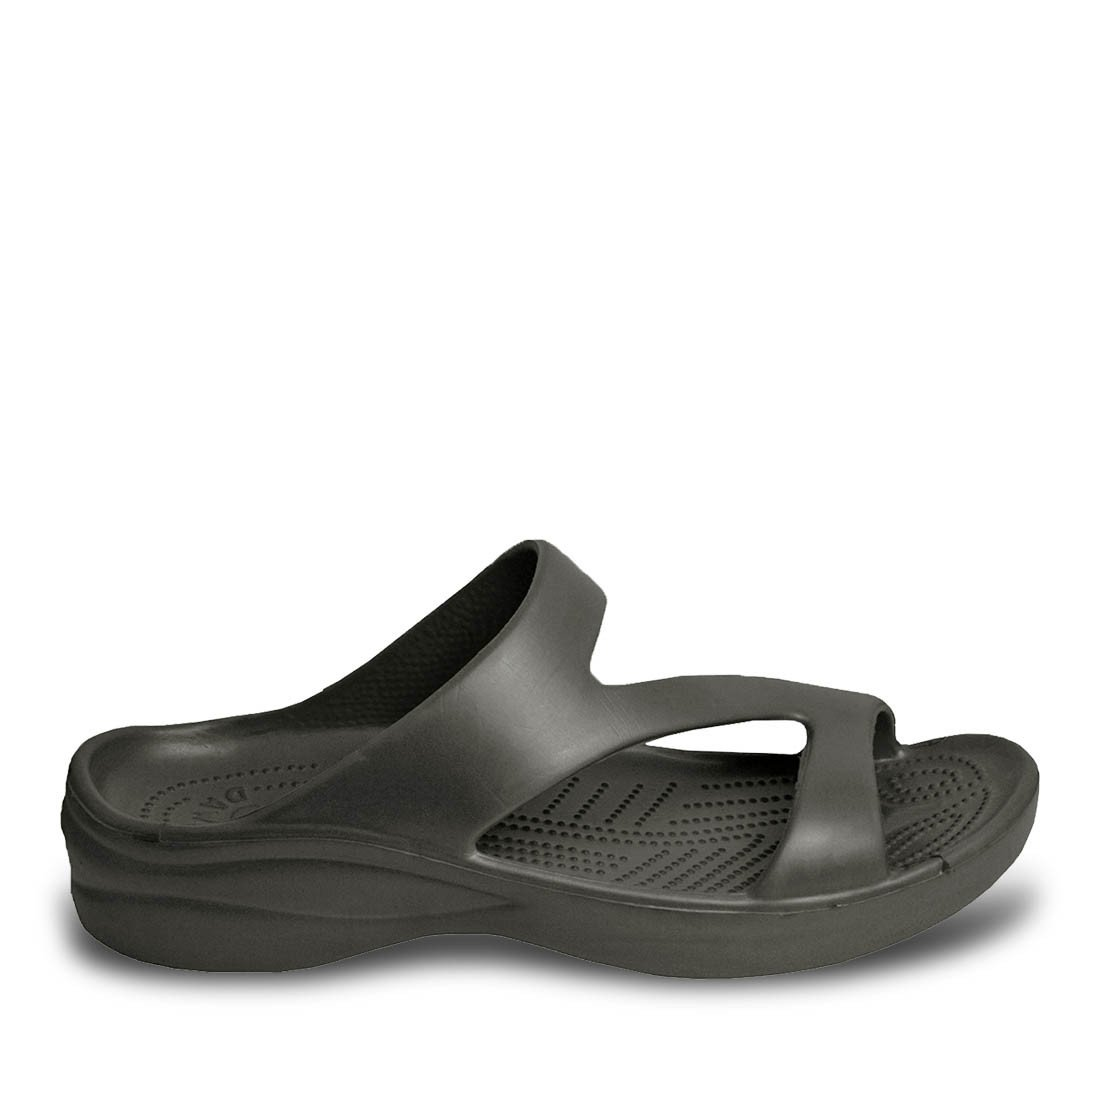 Image of Women's Z Sandals - Black